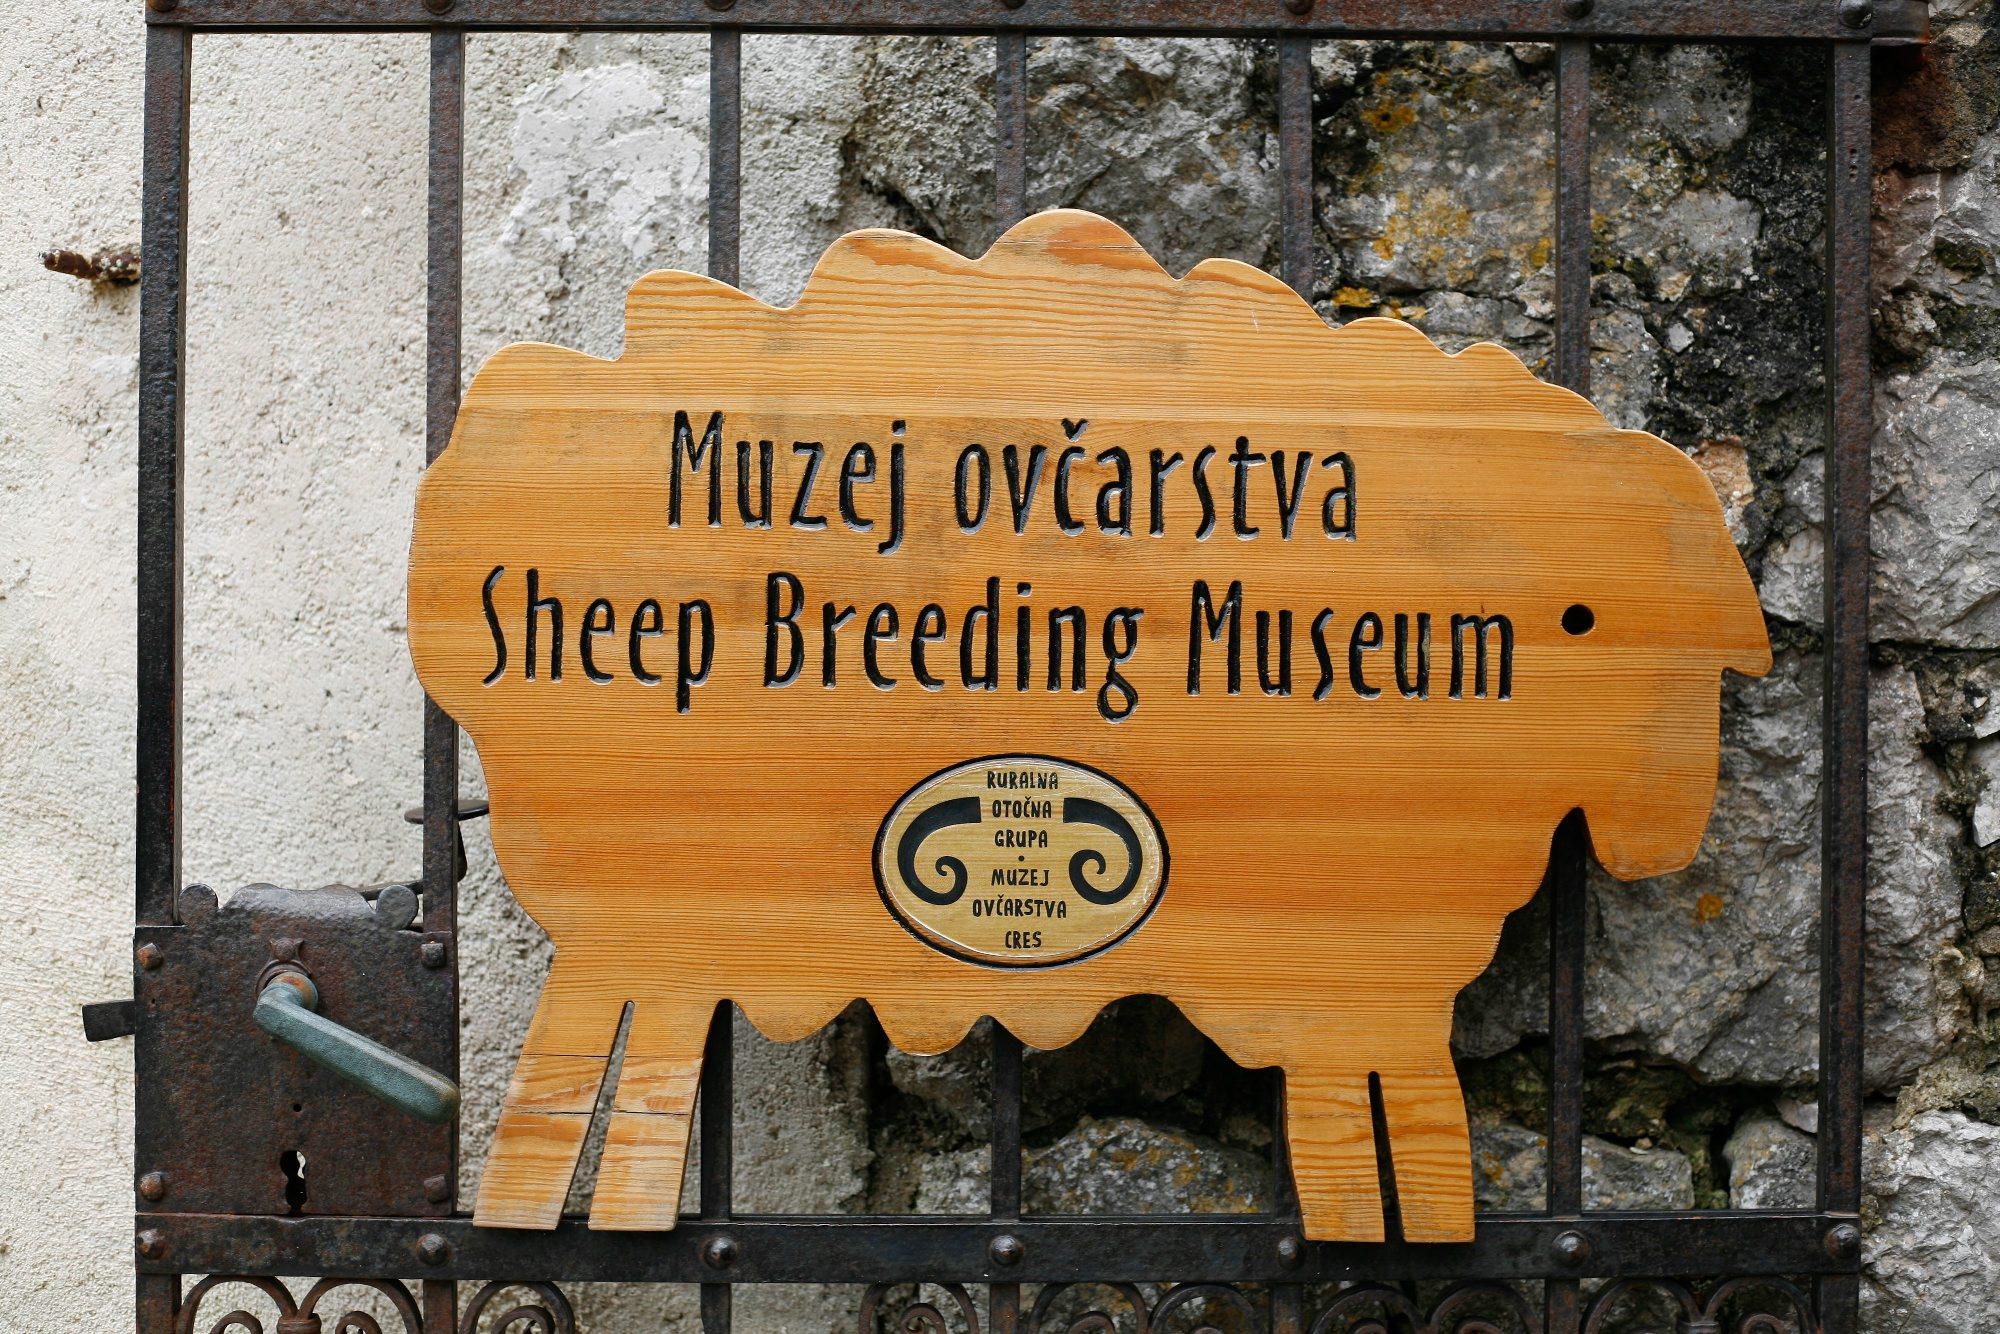 Lubenice, 060718. Muzej Ovcarstva. Tea de Both izradjuje od vune lutke, maske i razne igracke. Na fotografiji: muzej ovcarstva. Foto: Matija Djanjesic / CROPIX